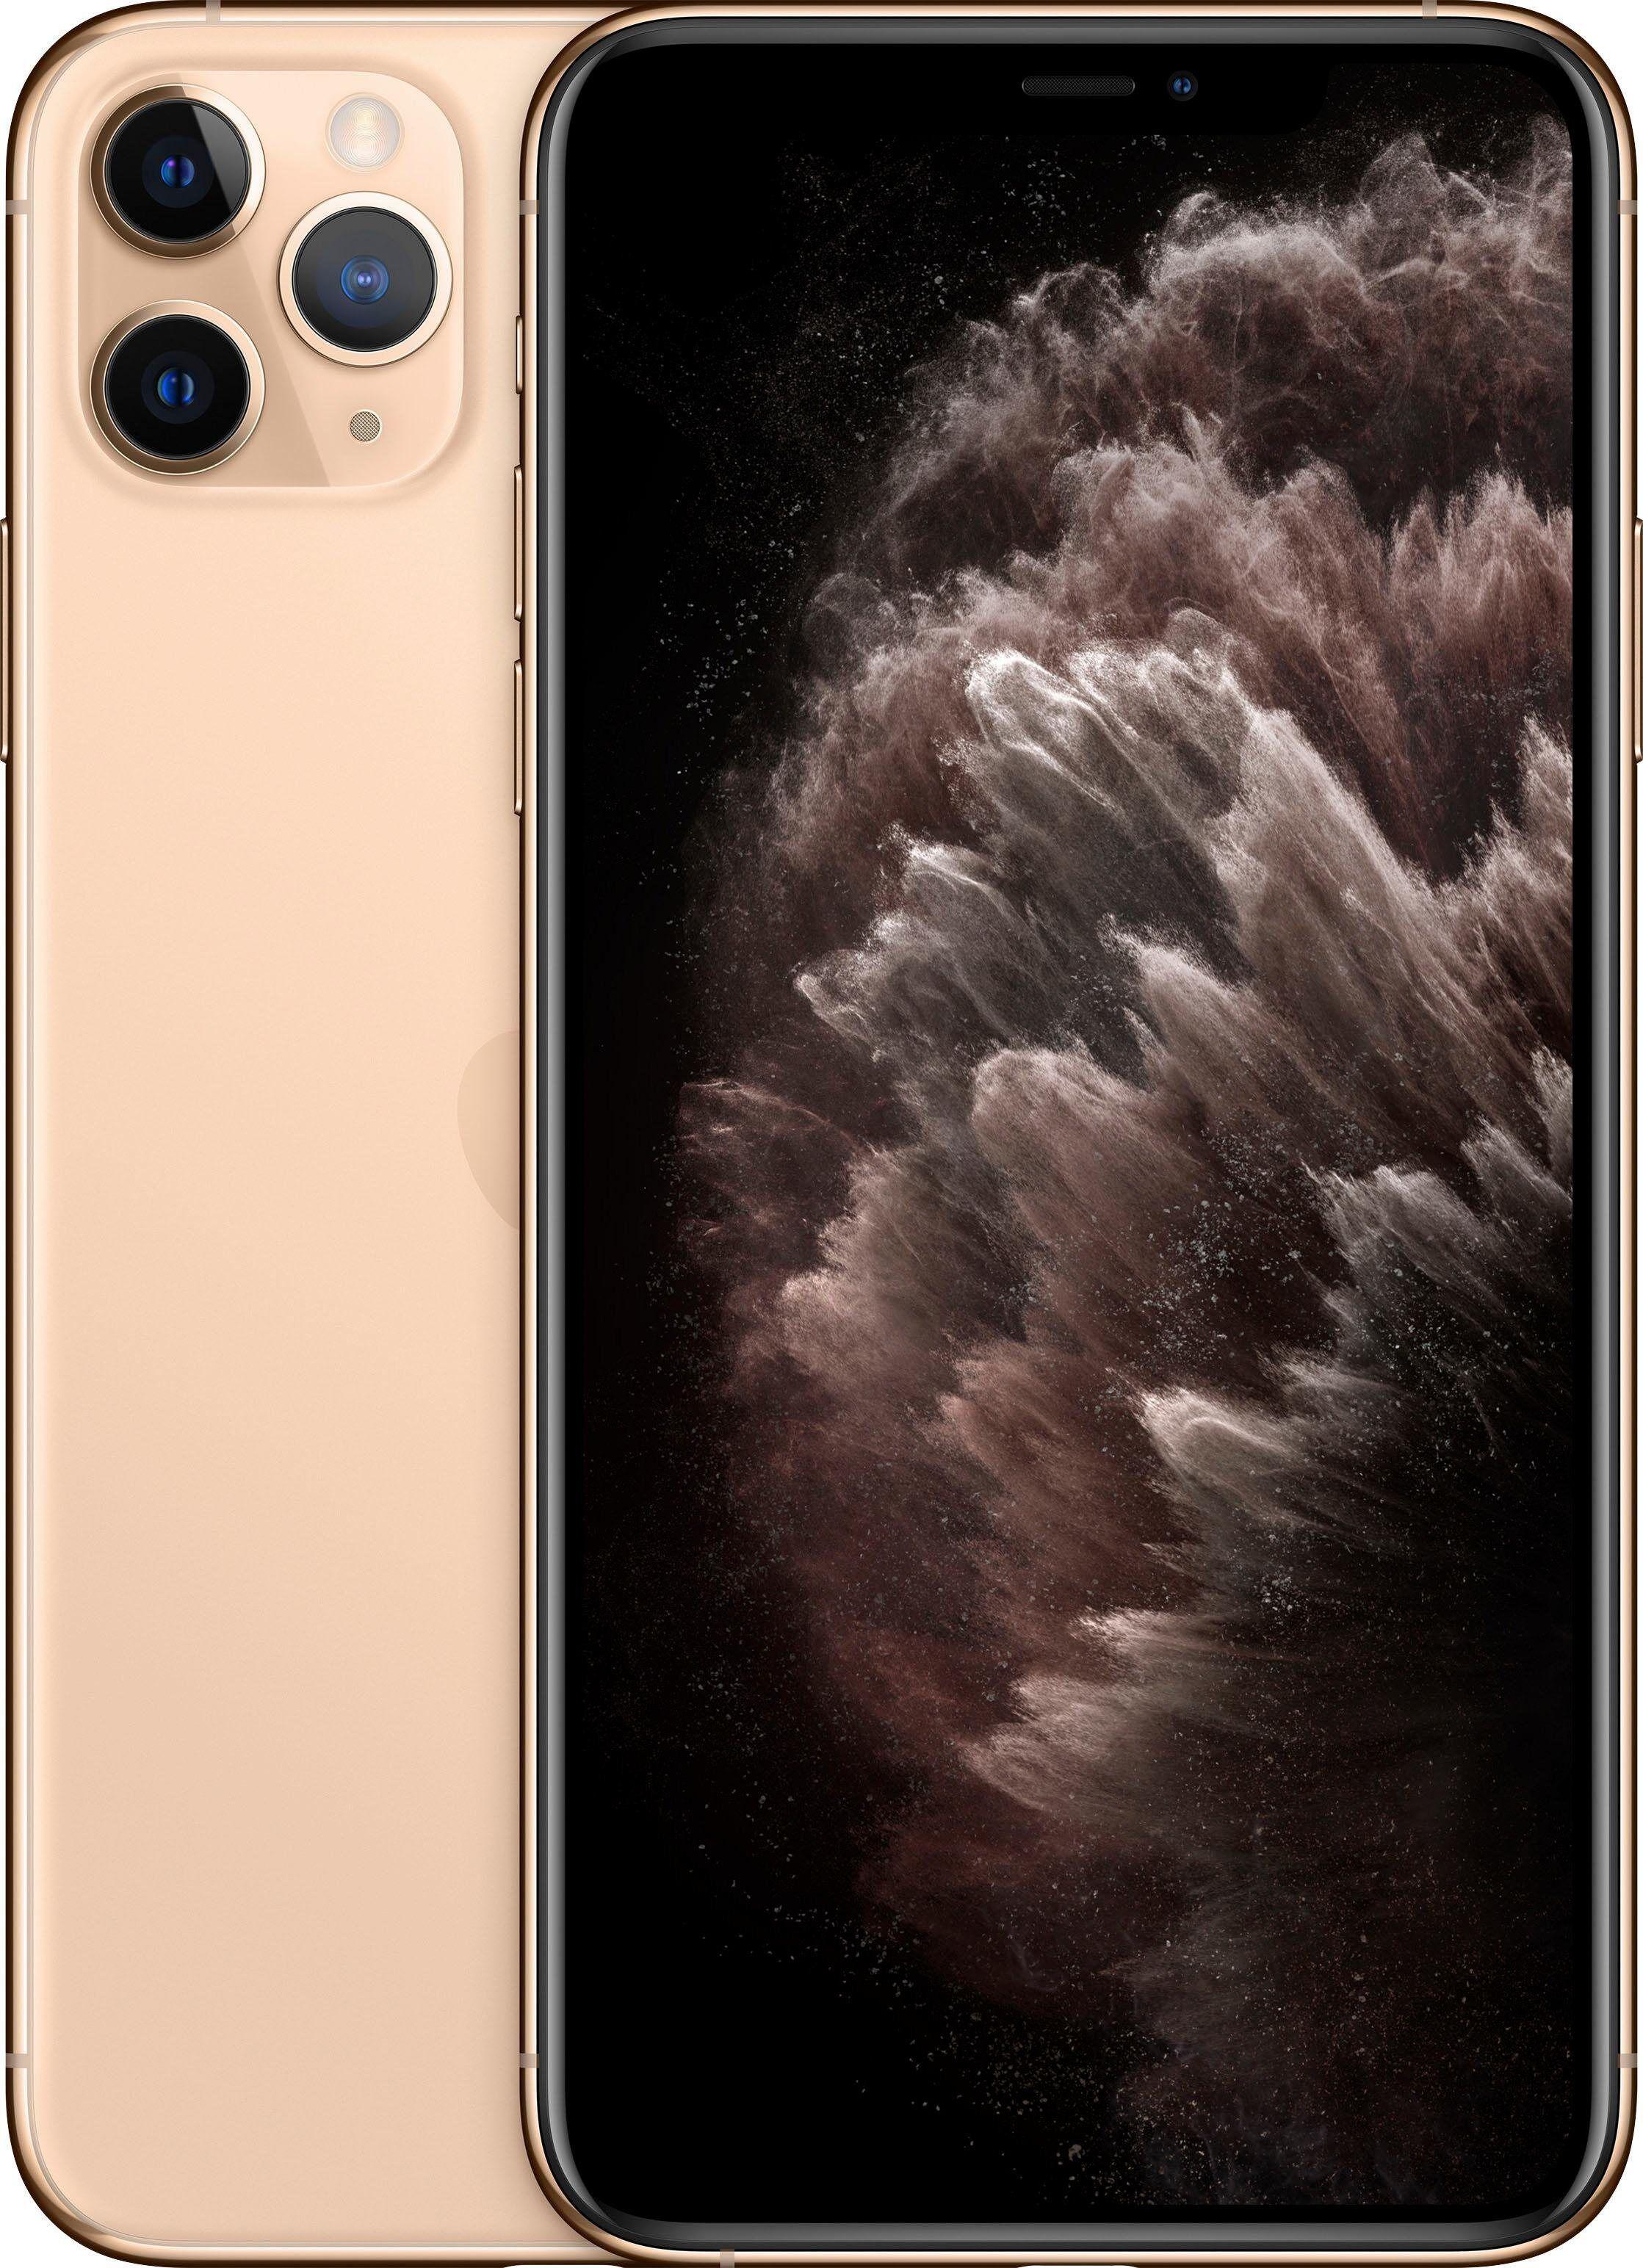 Apple iPhone 11 Pro Max Smartphone (16,5 cm/6,5 Zoll, 64 GB Speicherplatz, 12 MP Kamera), Gold